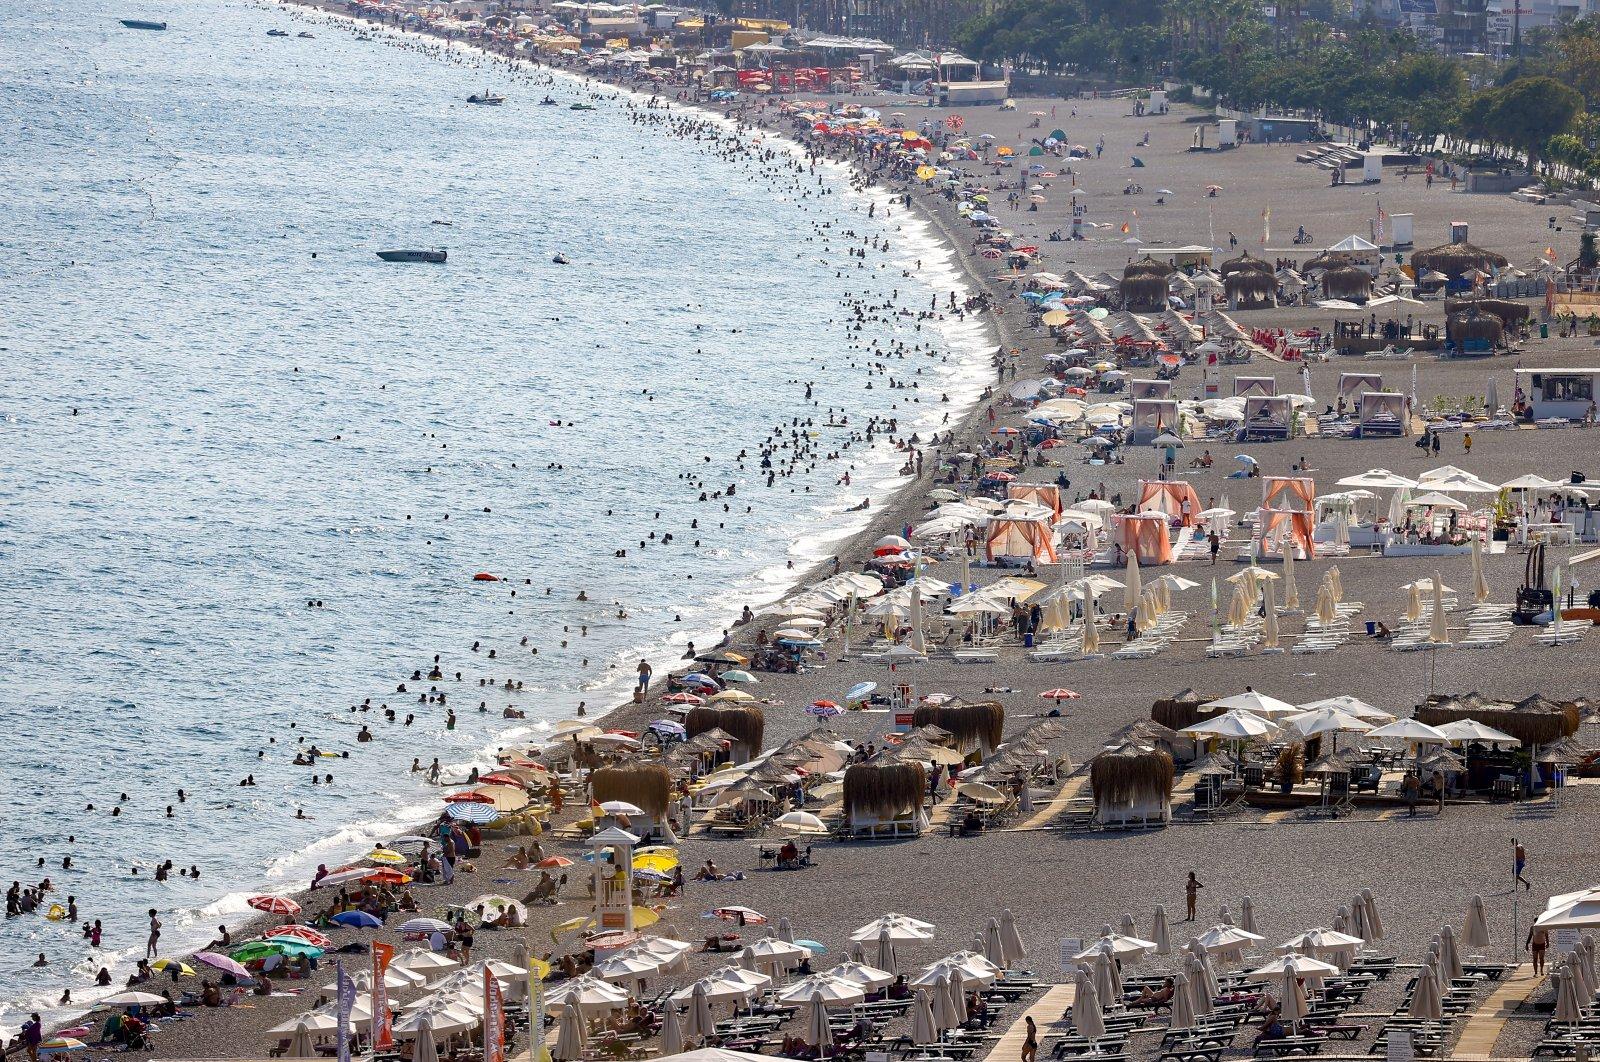 People are seen on a beach in the Mediterranean coastal city of Antalya, Turkey, Aug. 24, 2021. (AA Photo)